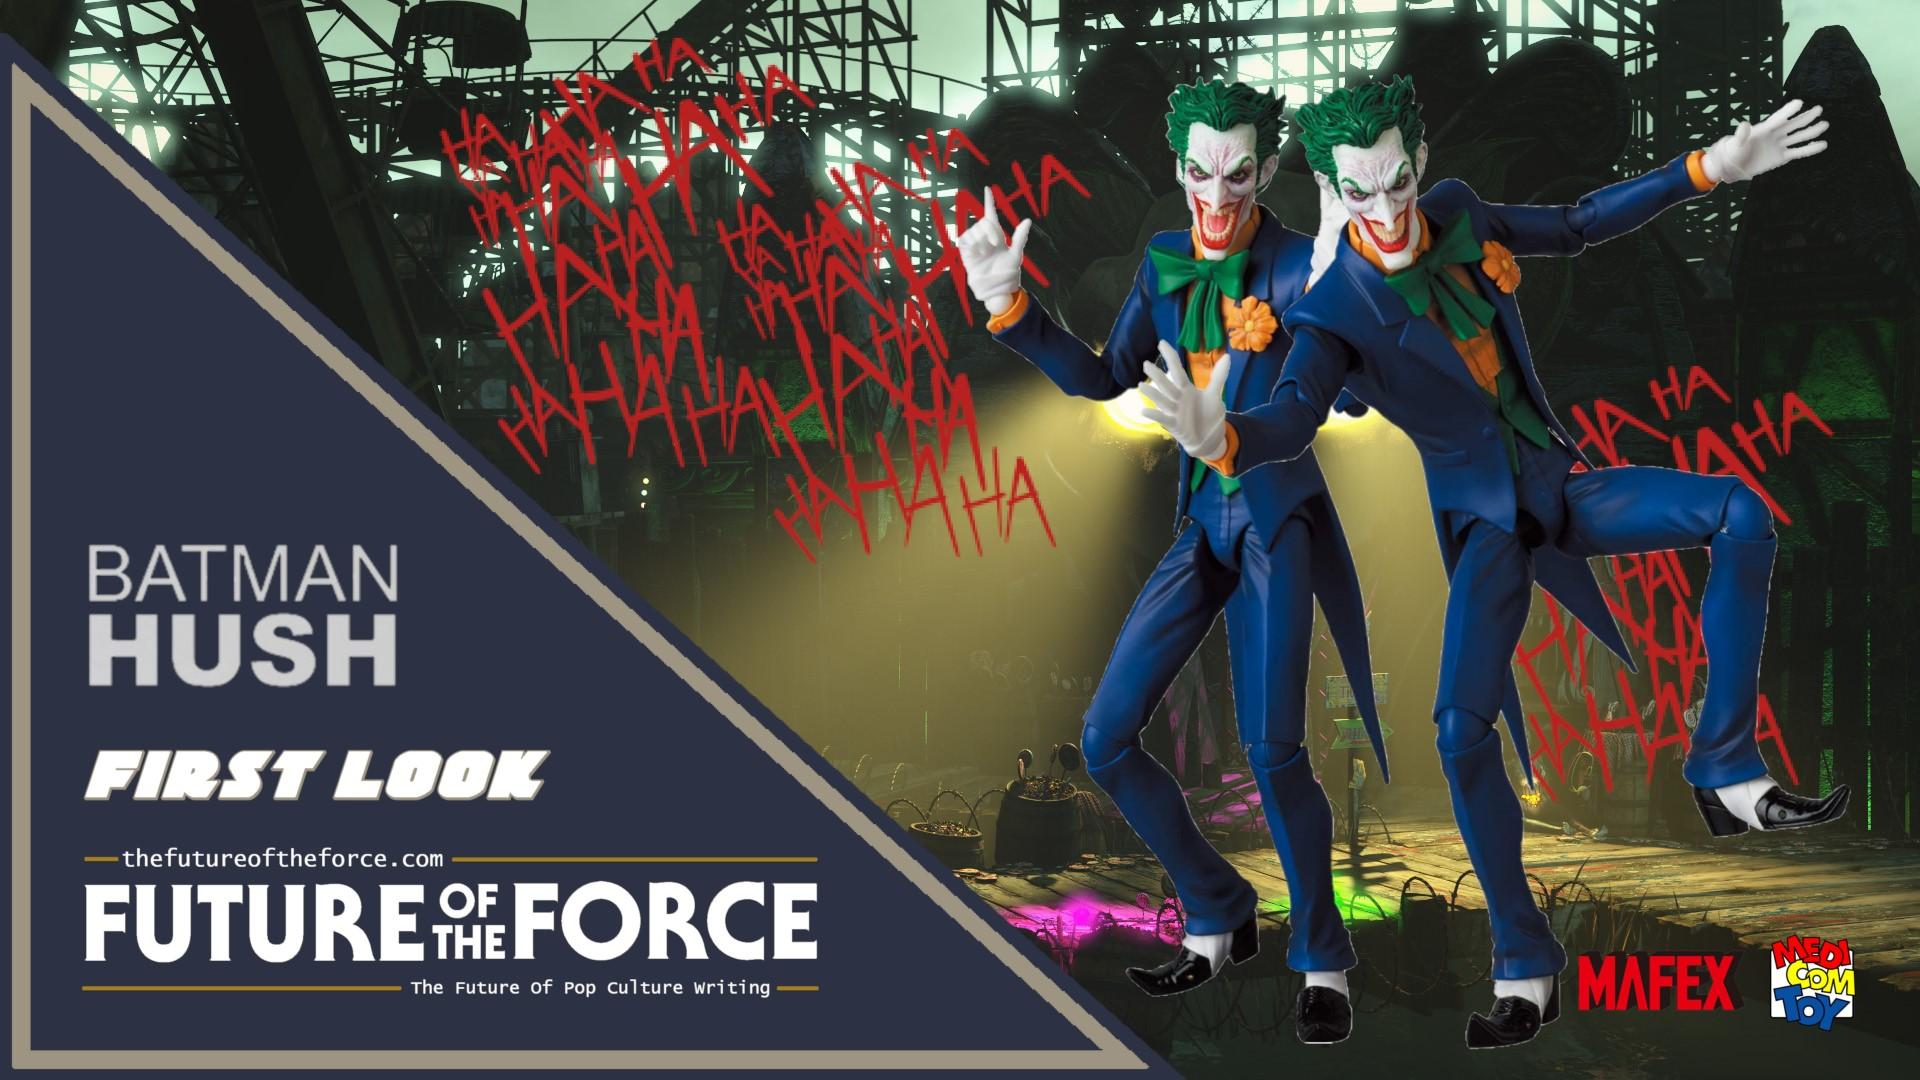 First Look The Joker Batman Hush Mafex Medicom Future Of The Force